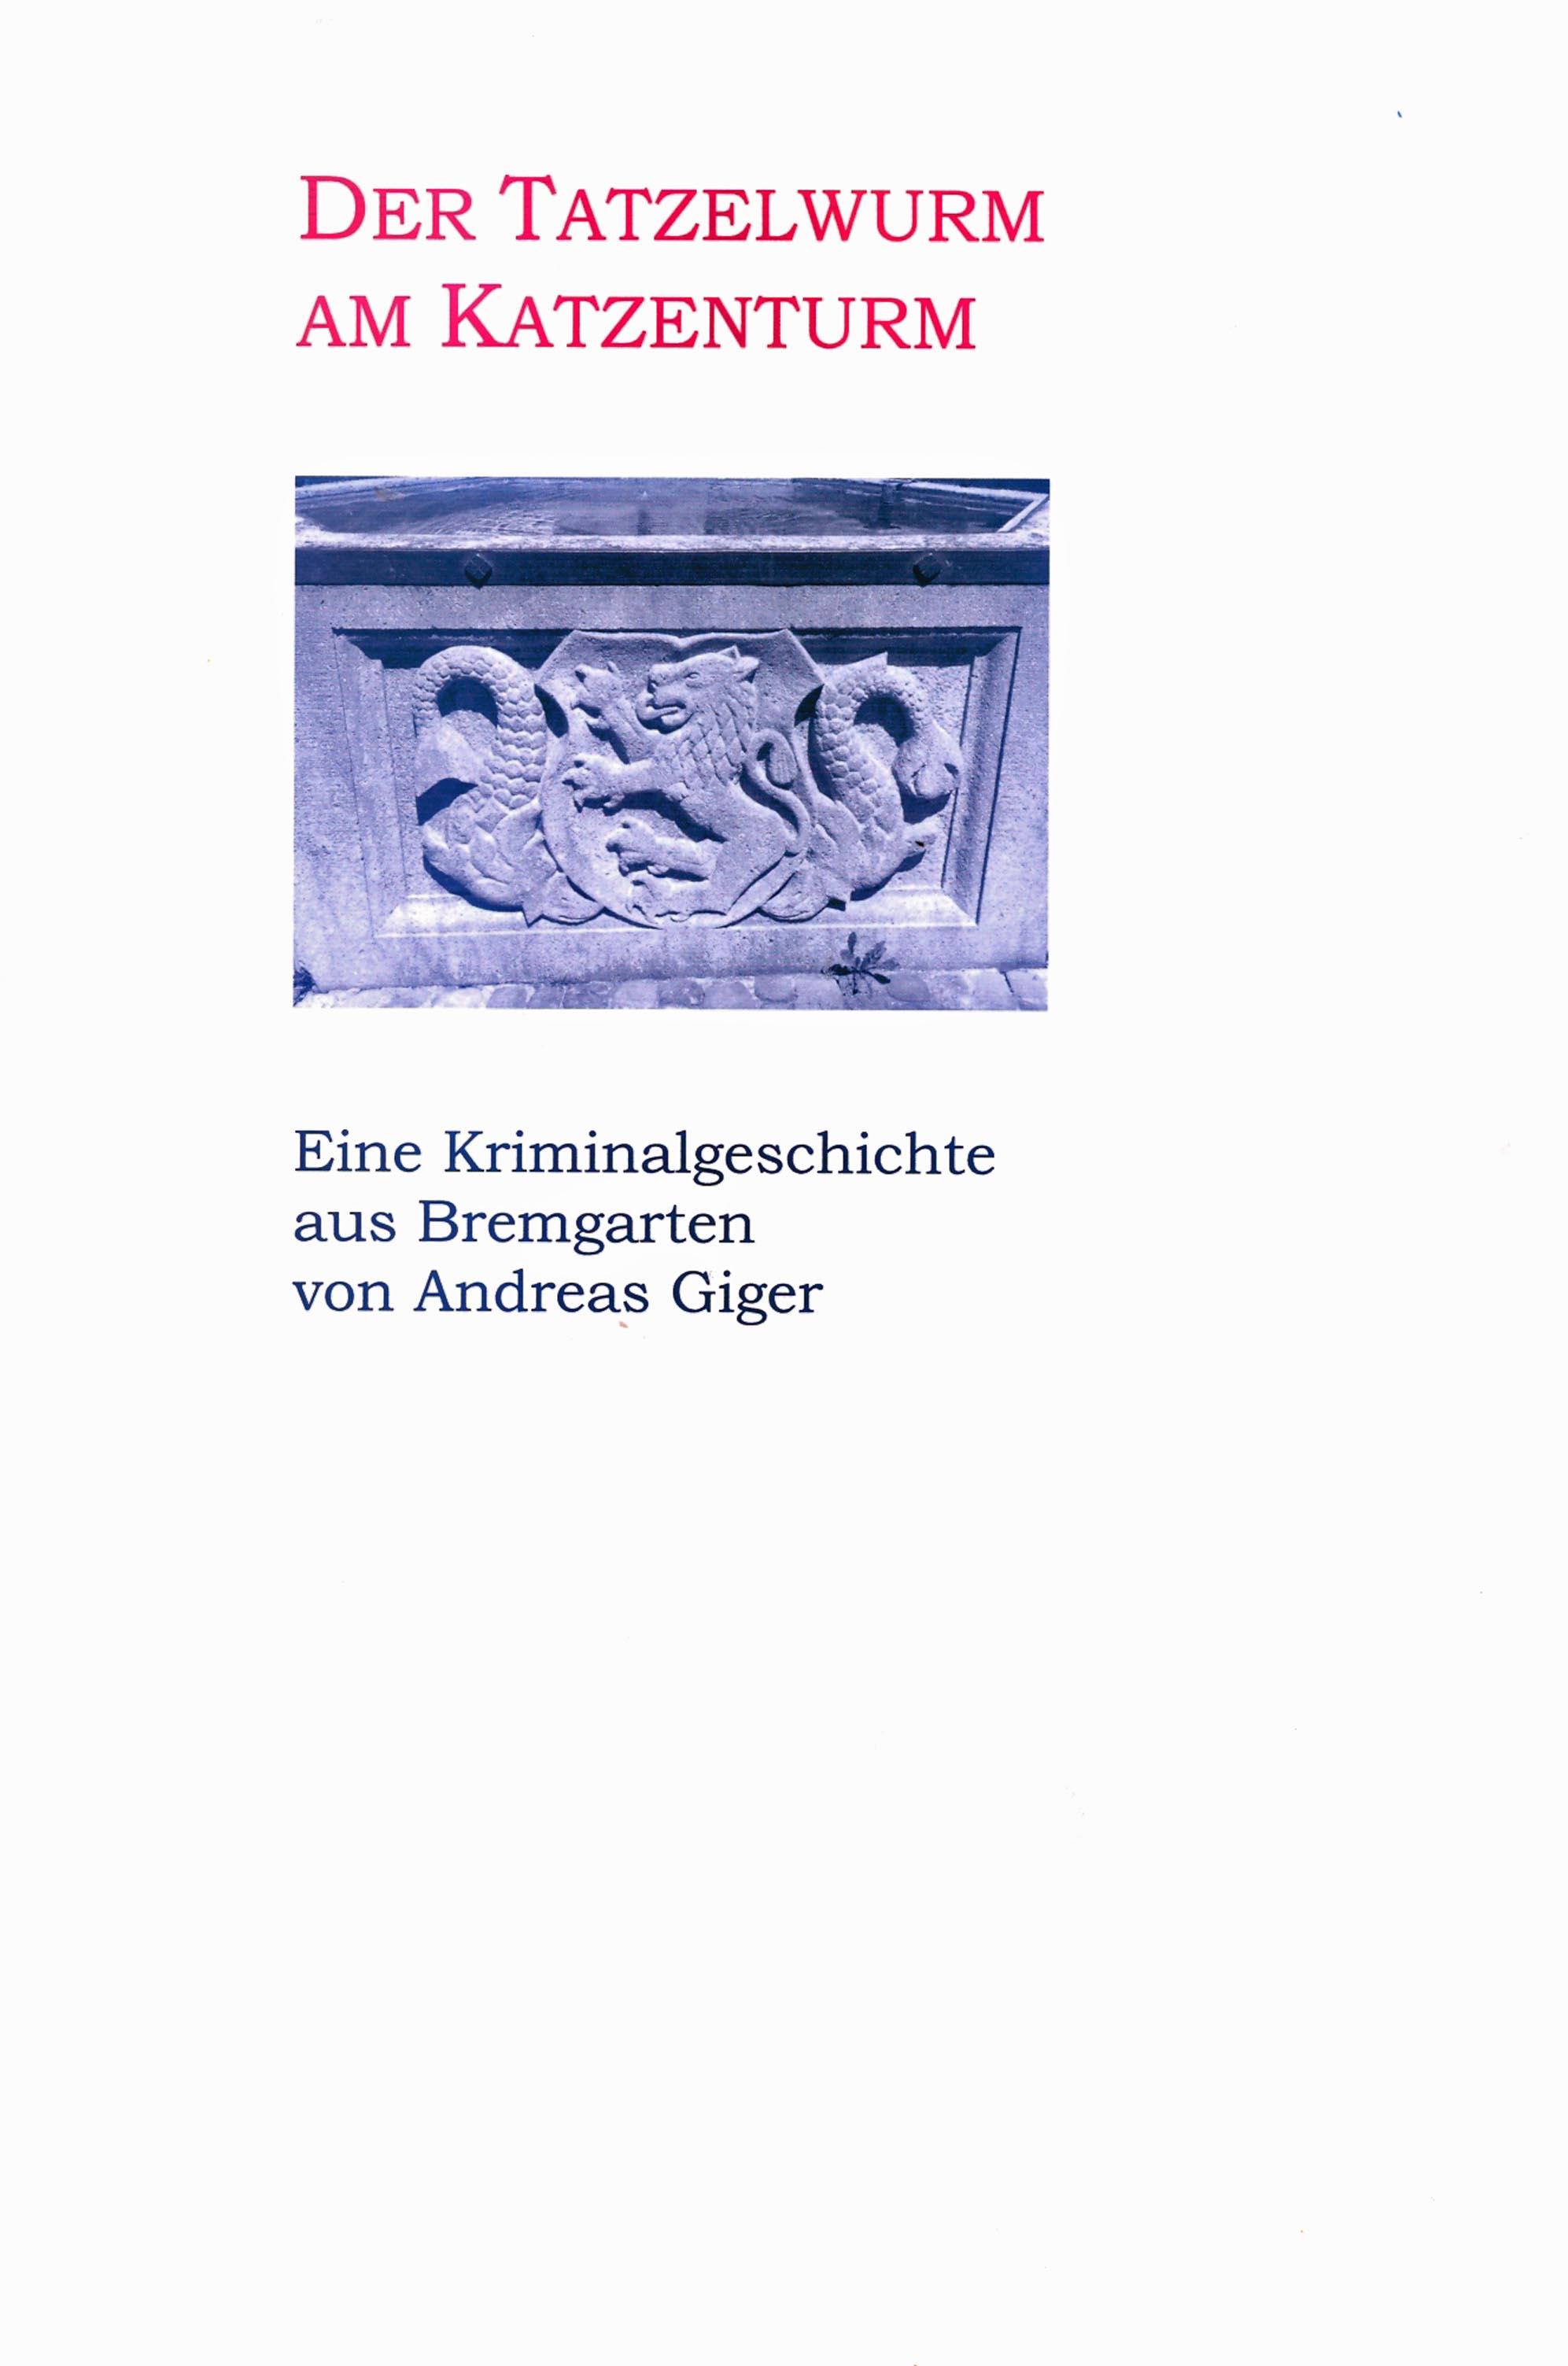 цена на Andreas Giger Der Tatzelwurm am Katzenturm - Eine Kriminalgeschichte aus Bremgarten